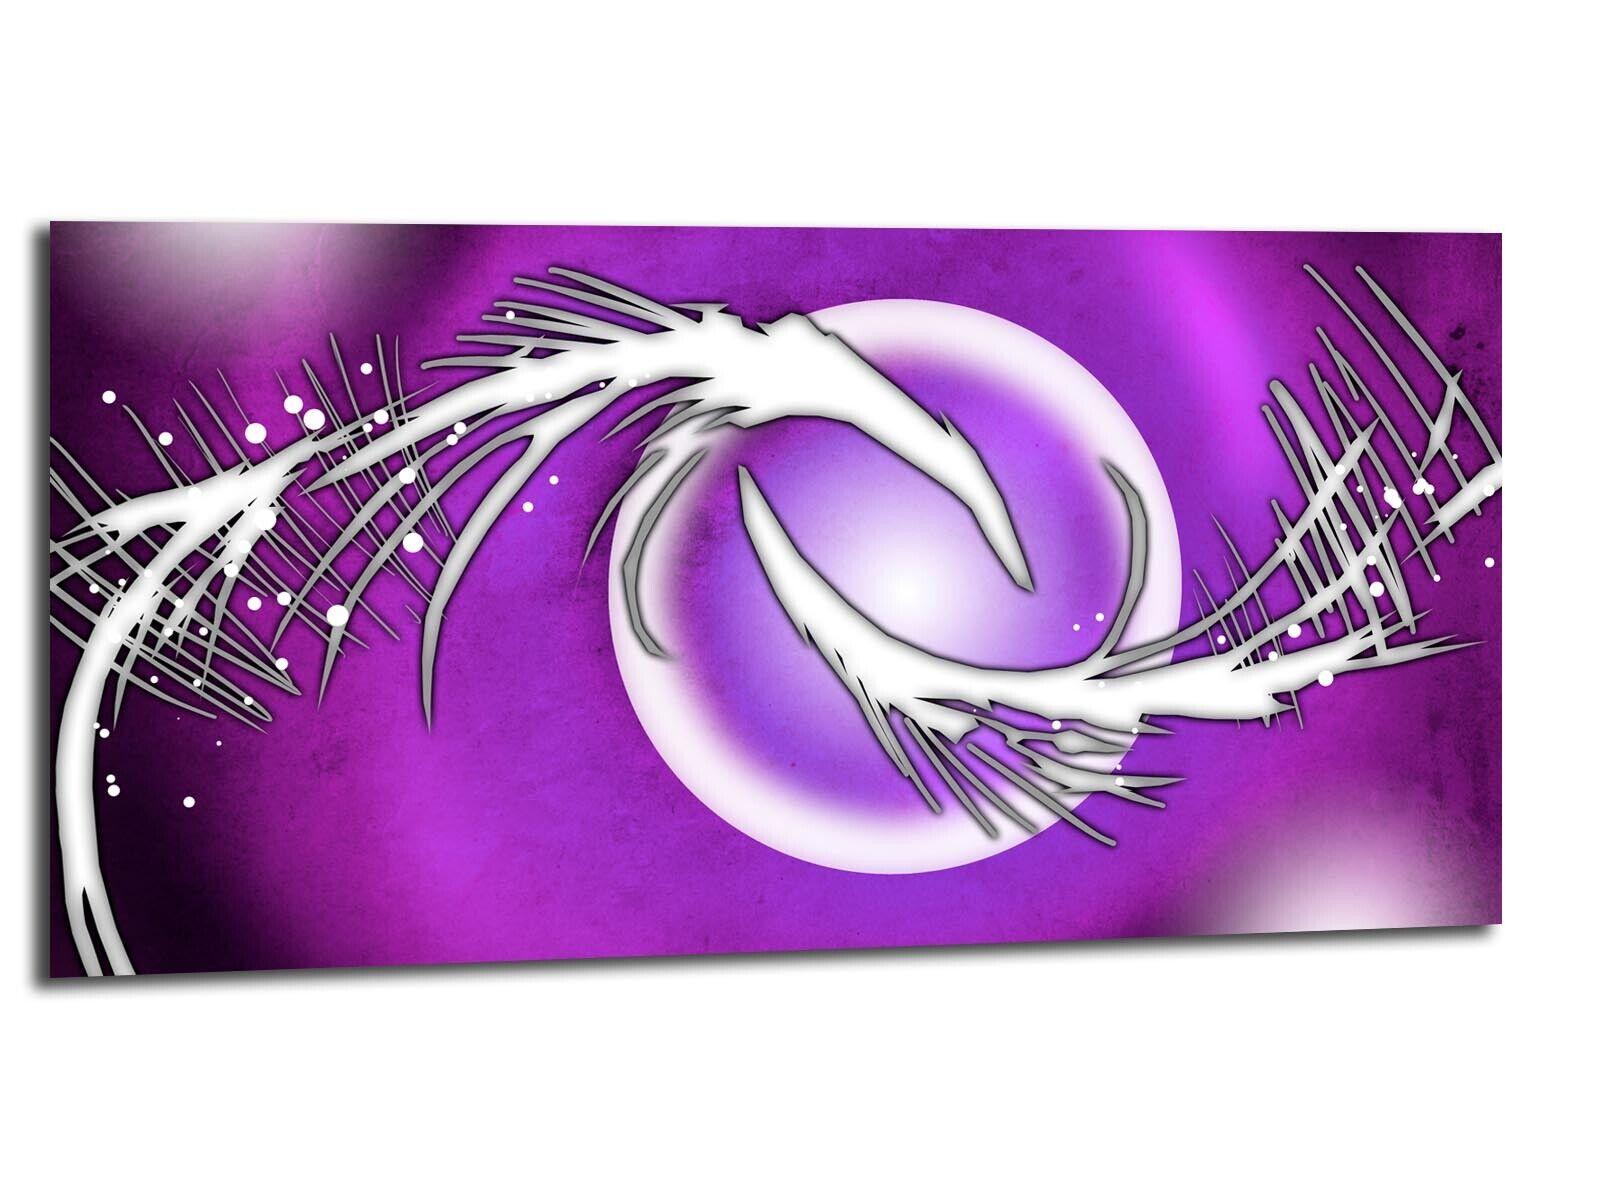 Alu-Dibond Bild ALU100501343 KUNST MODERN lila 100 x 50 cm Wandbild ABSTRAKT